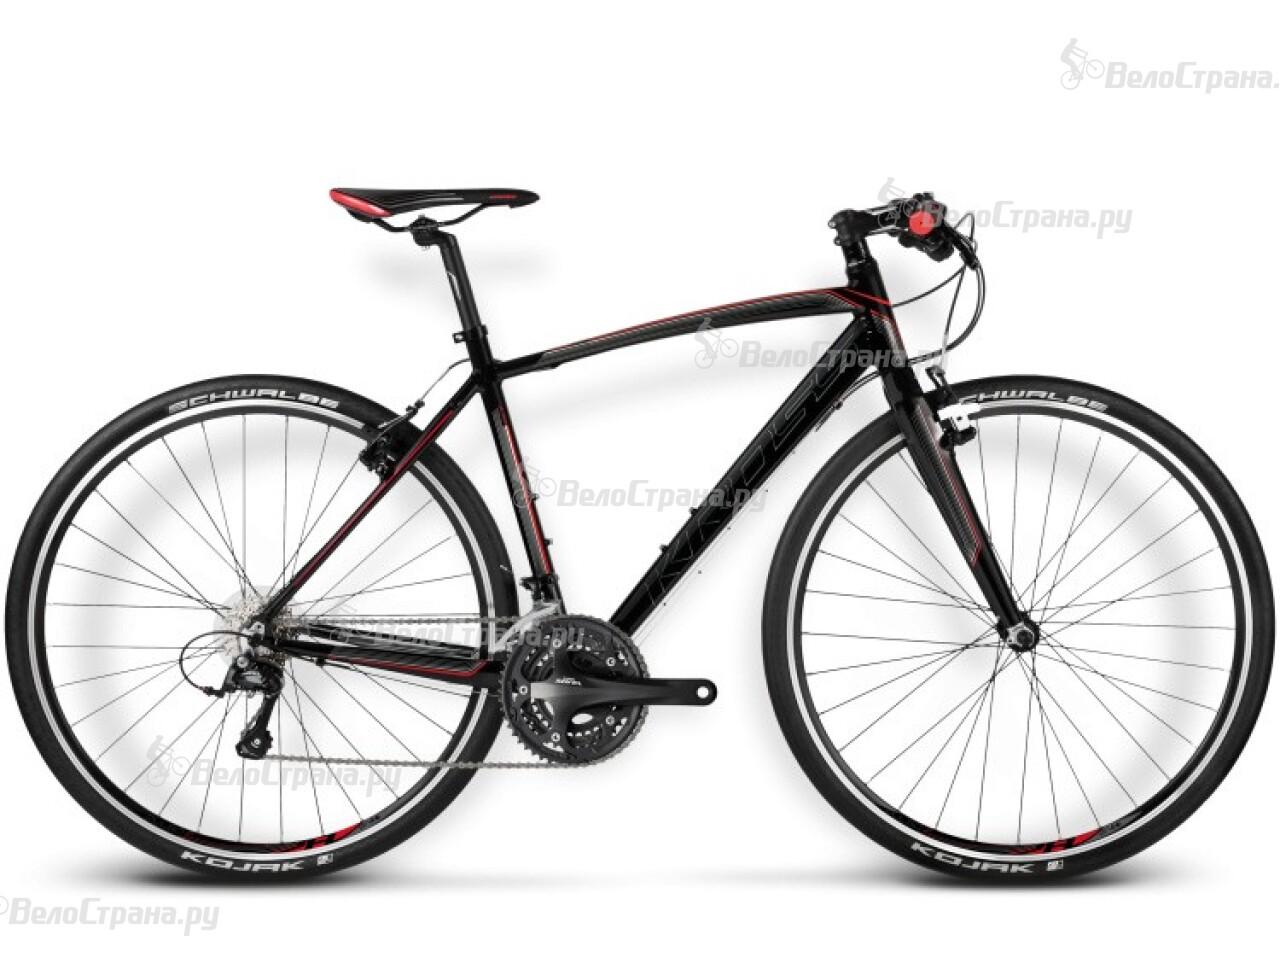 Велосипед Kross PULSO 2 (2016) велосипед kross pulso 1 2015